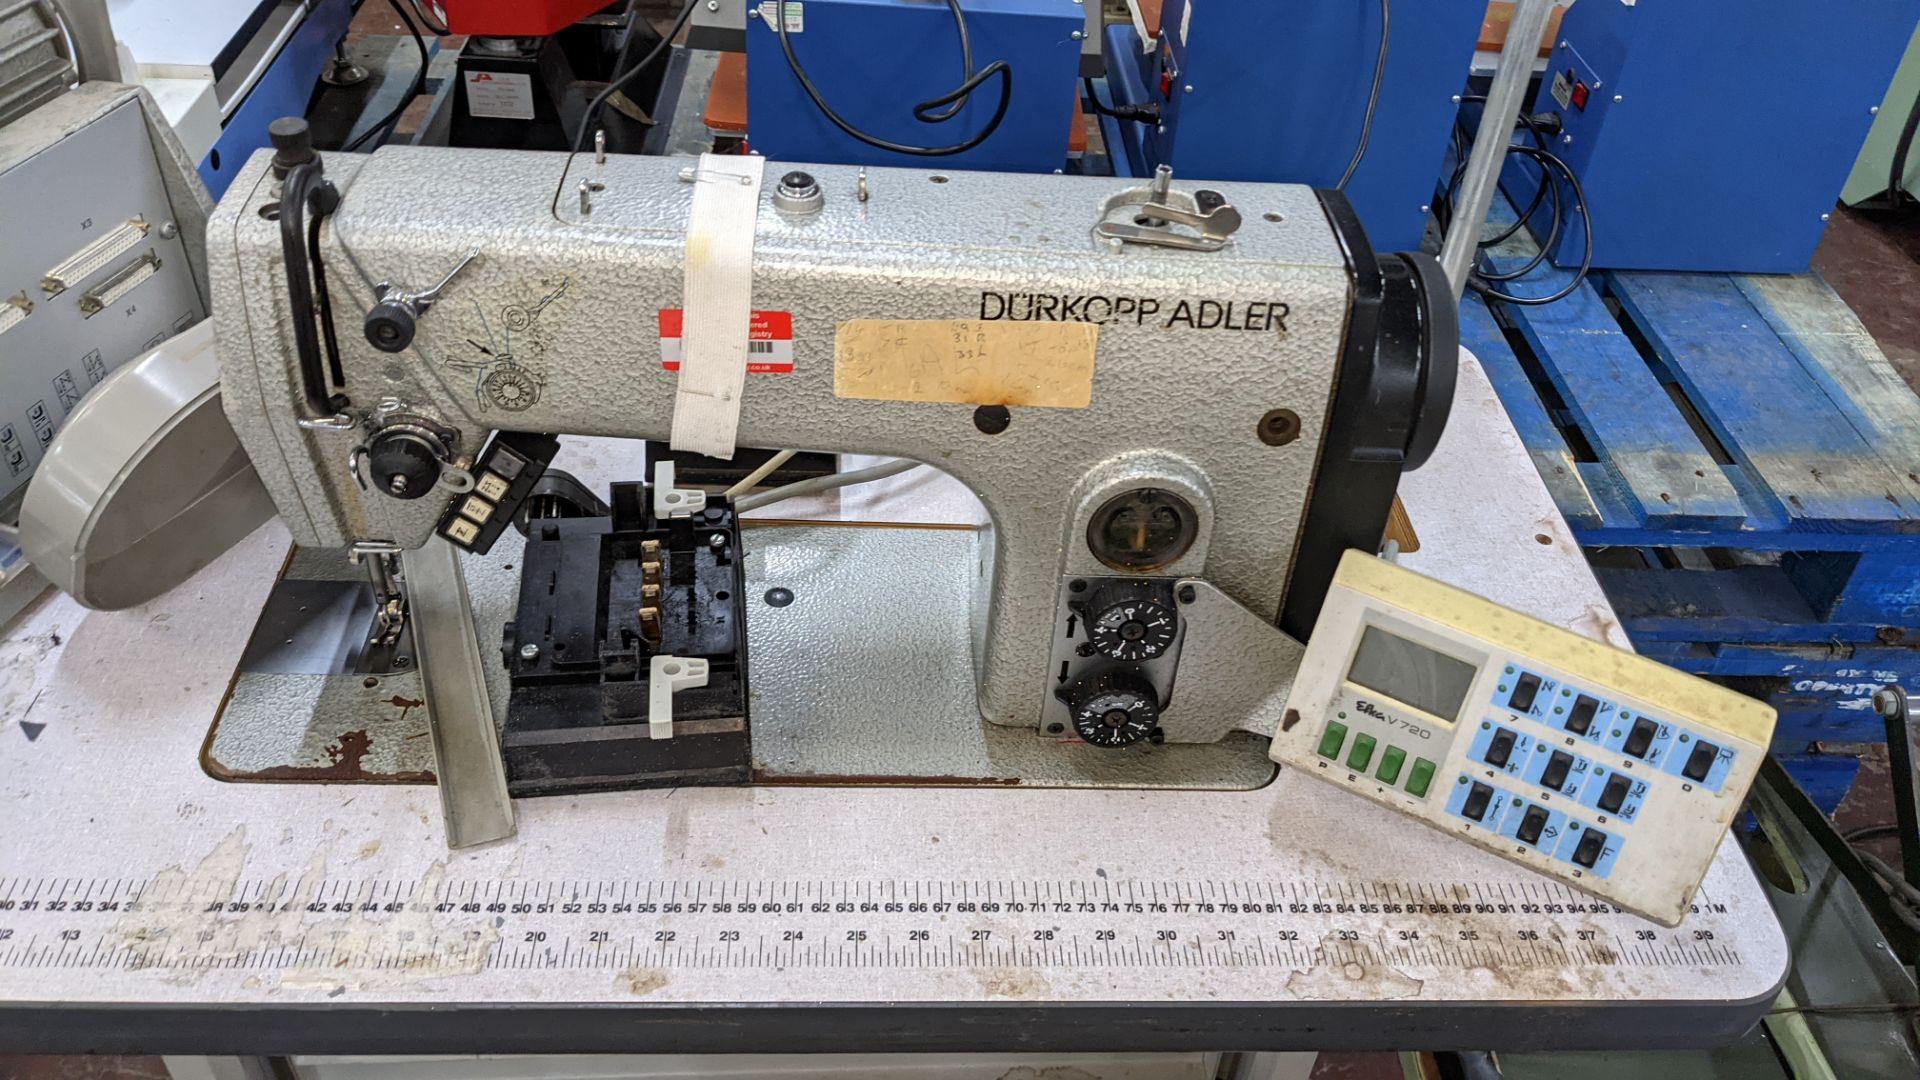 Durkopp Adler type 0271-L40042 sewing machine - Image 6 of 19